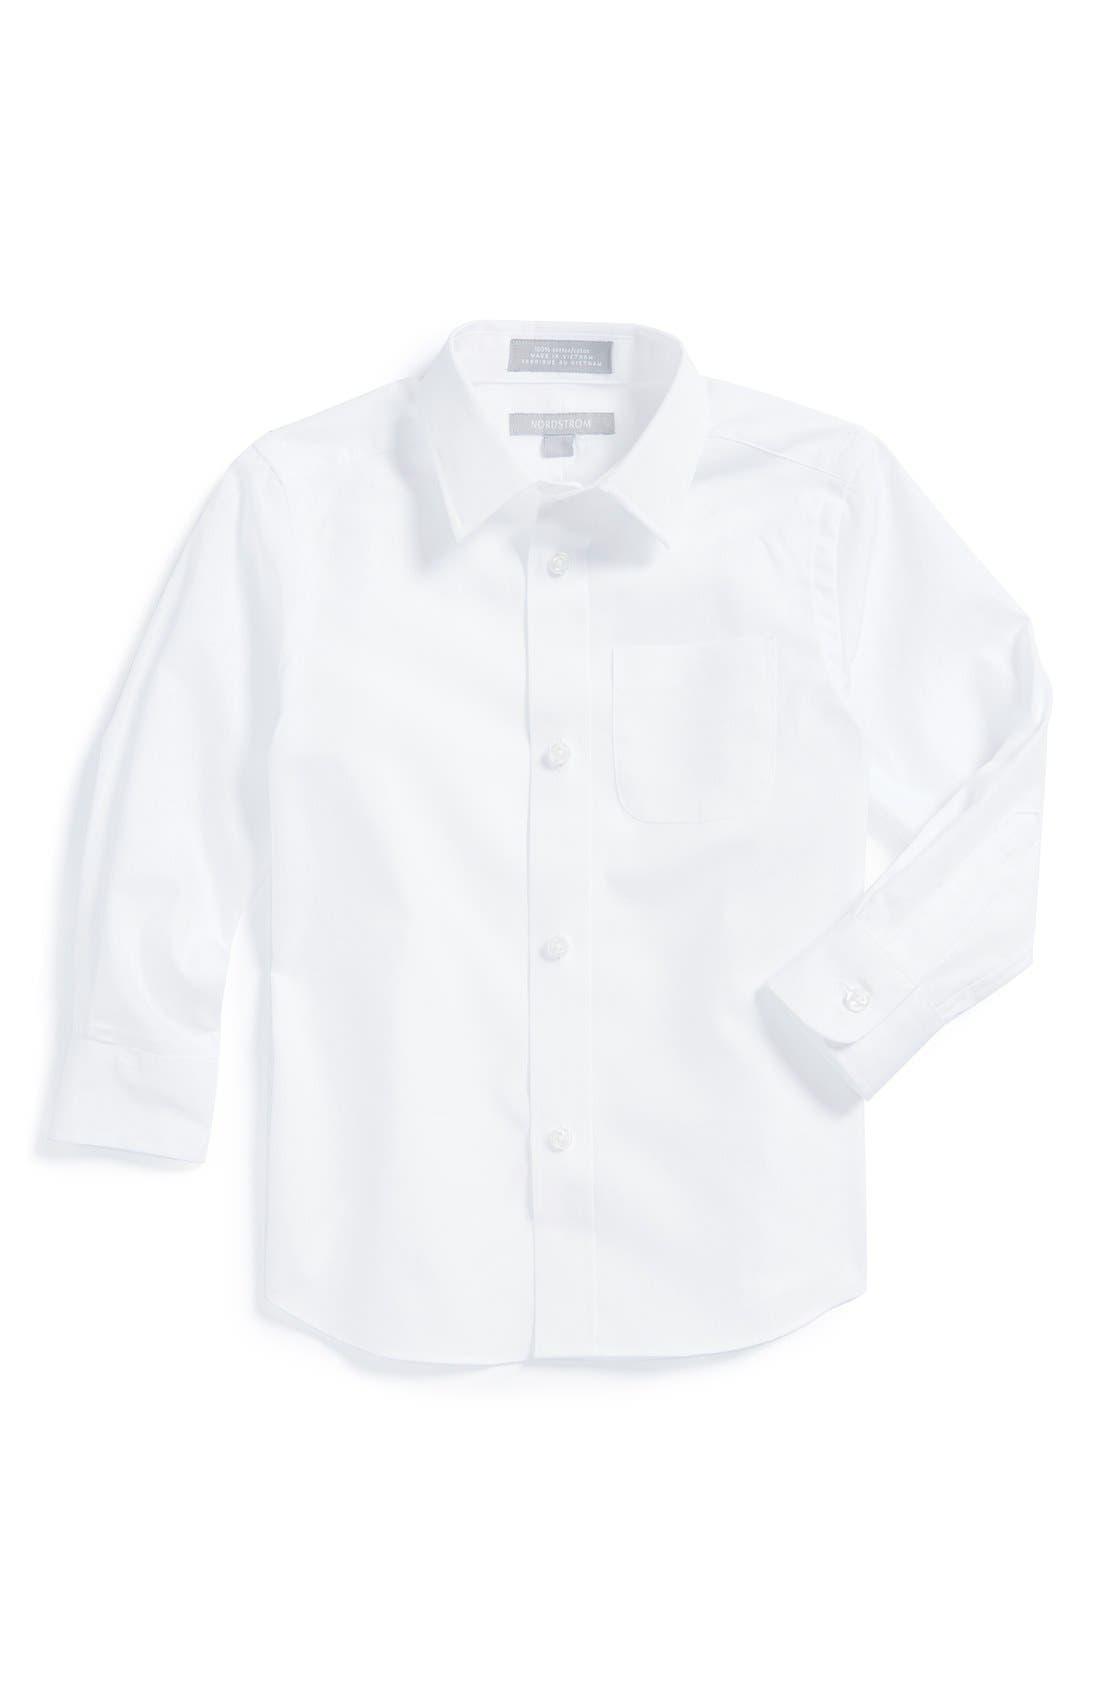 Nordstrom Cotton Poplin Dress Shirt (Toddler Boys)